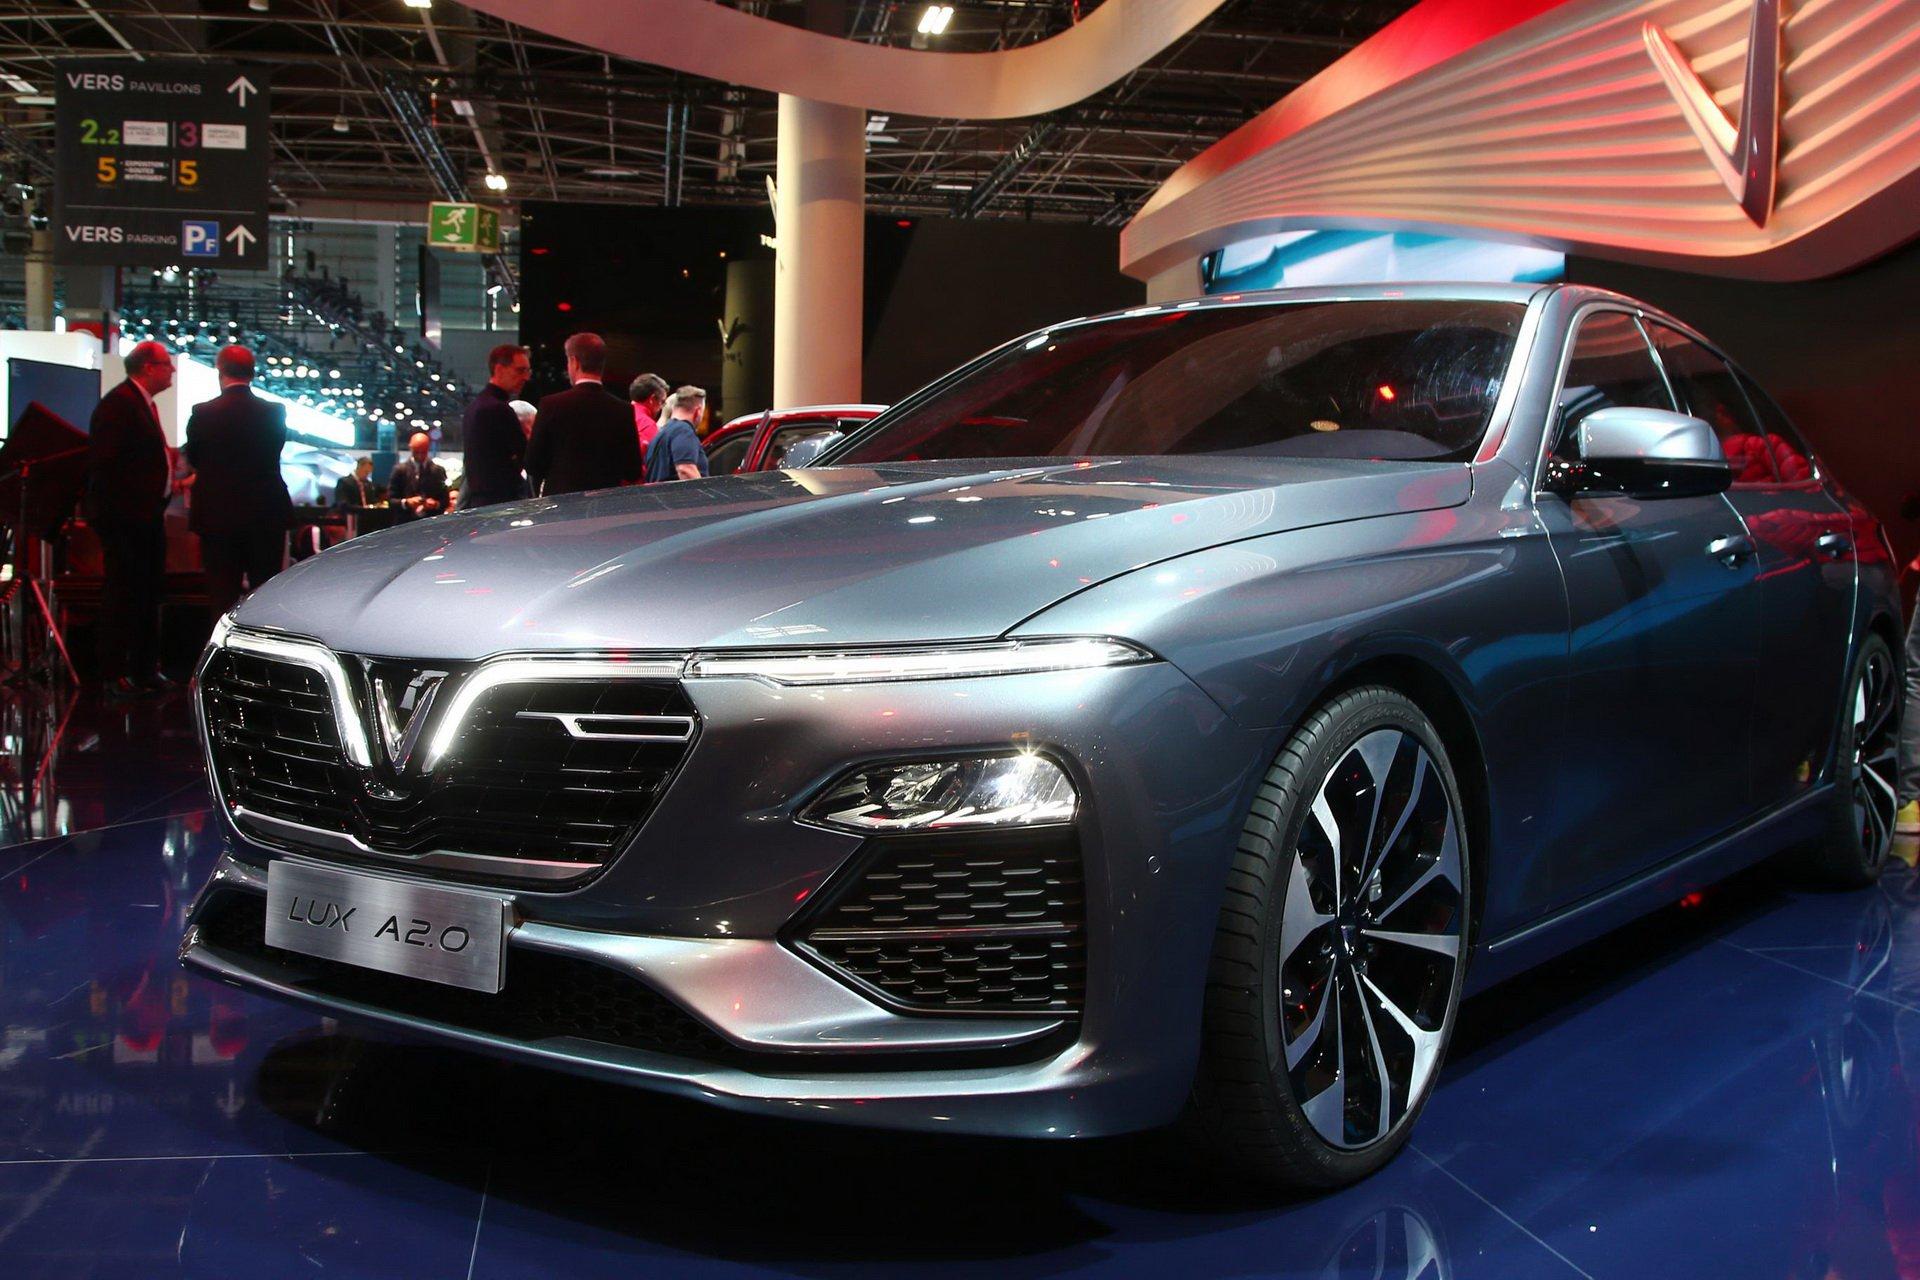 Париж 2018: вьетнамцы представили автомобили на базе BMW